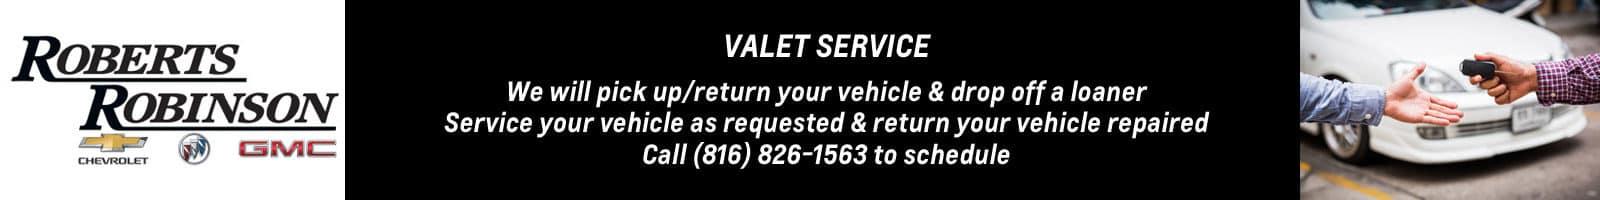 Schedule Valet Pickup